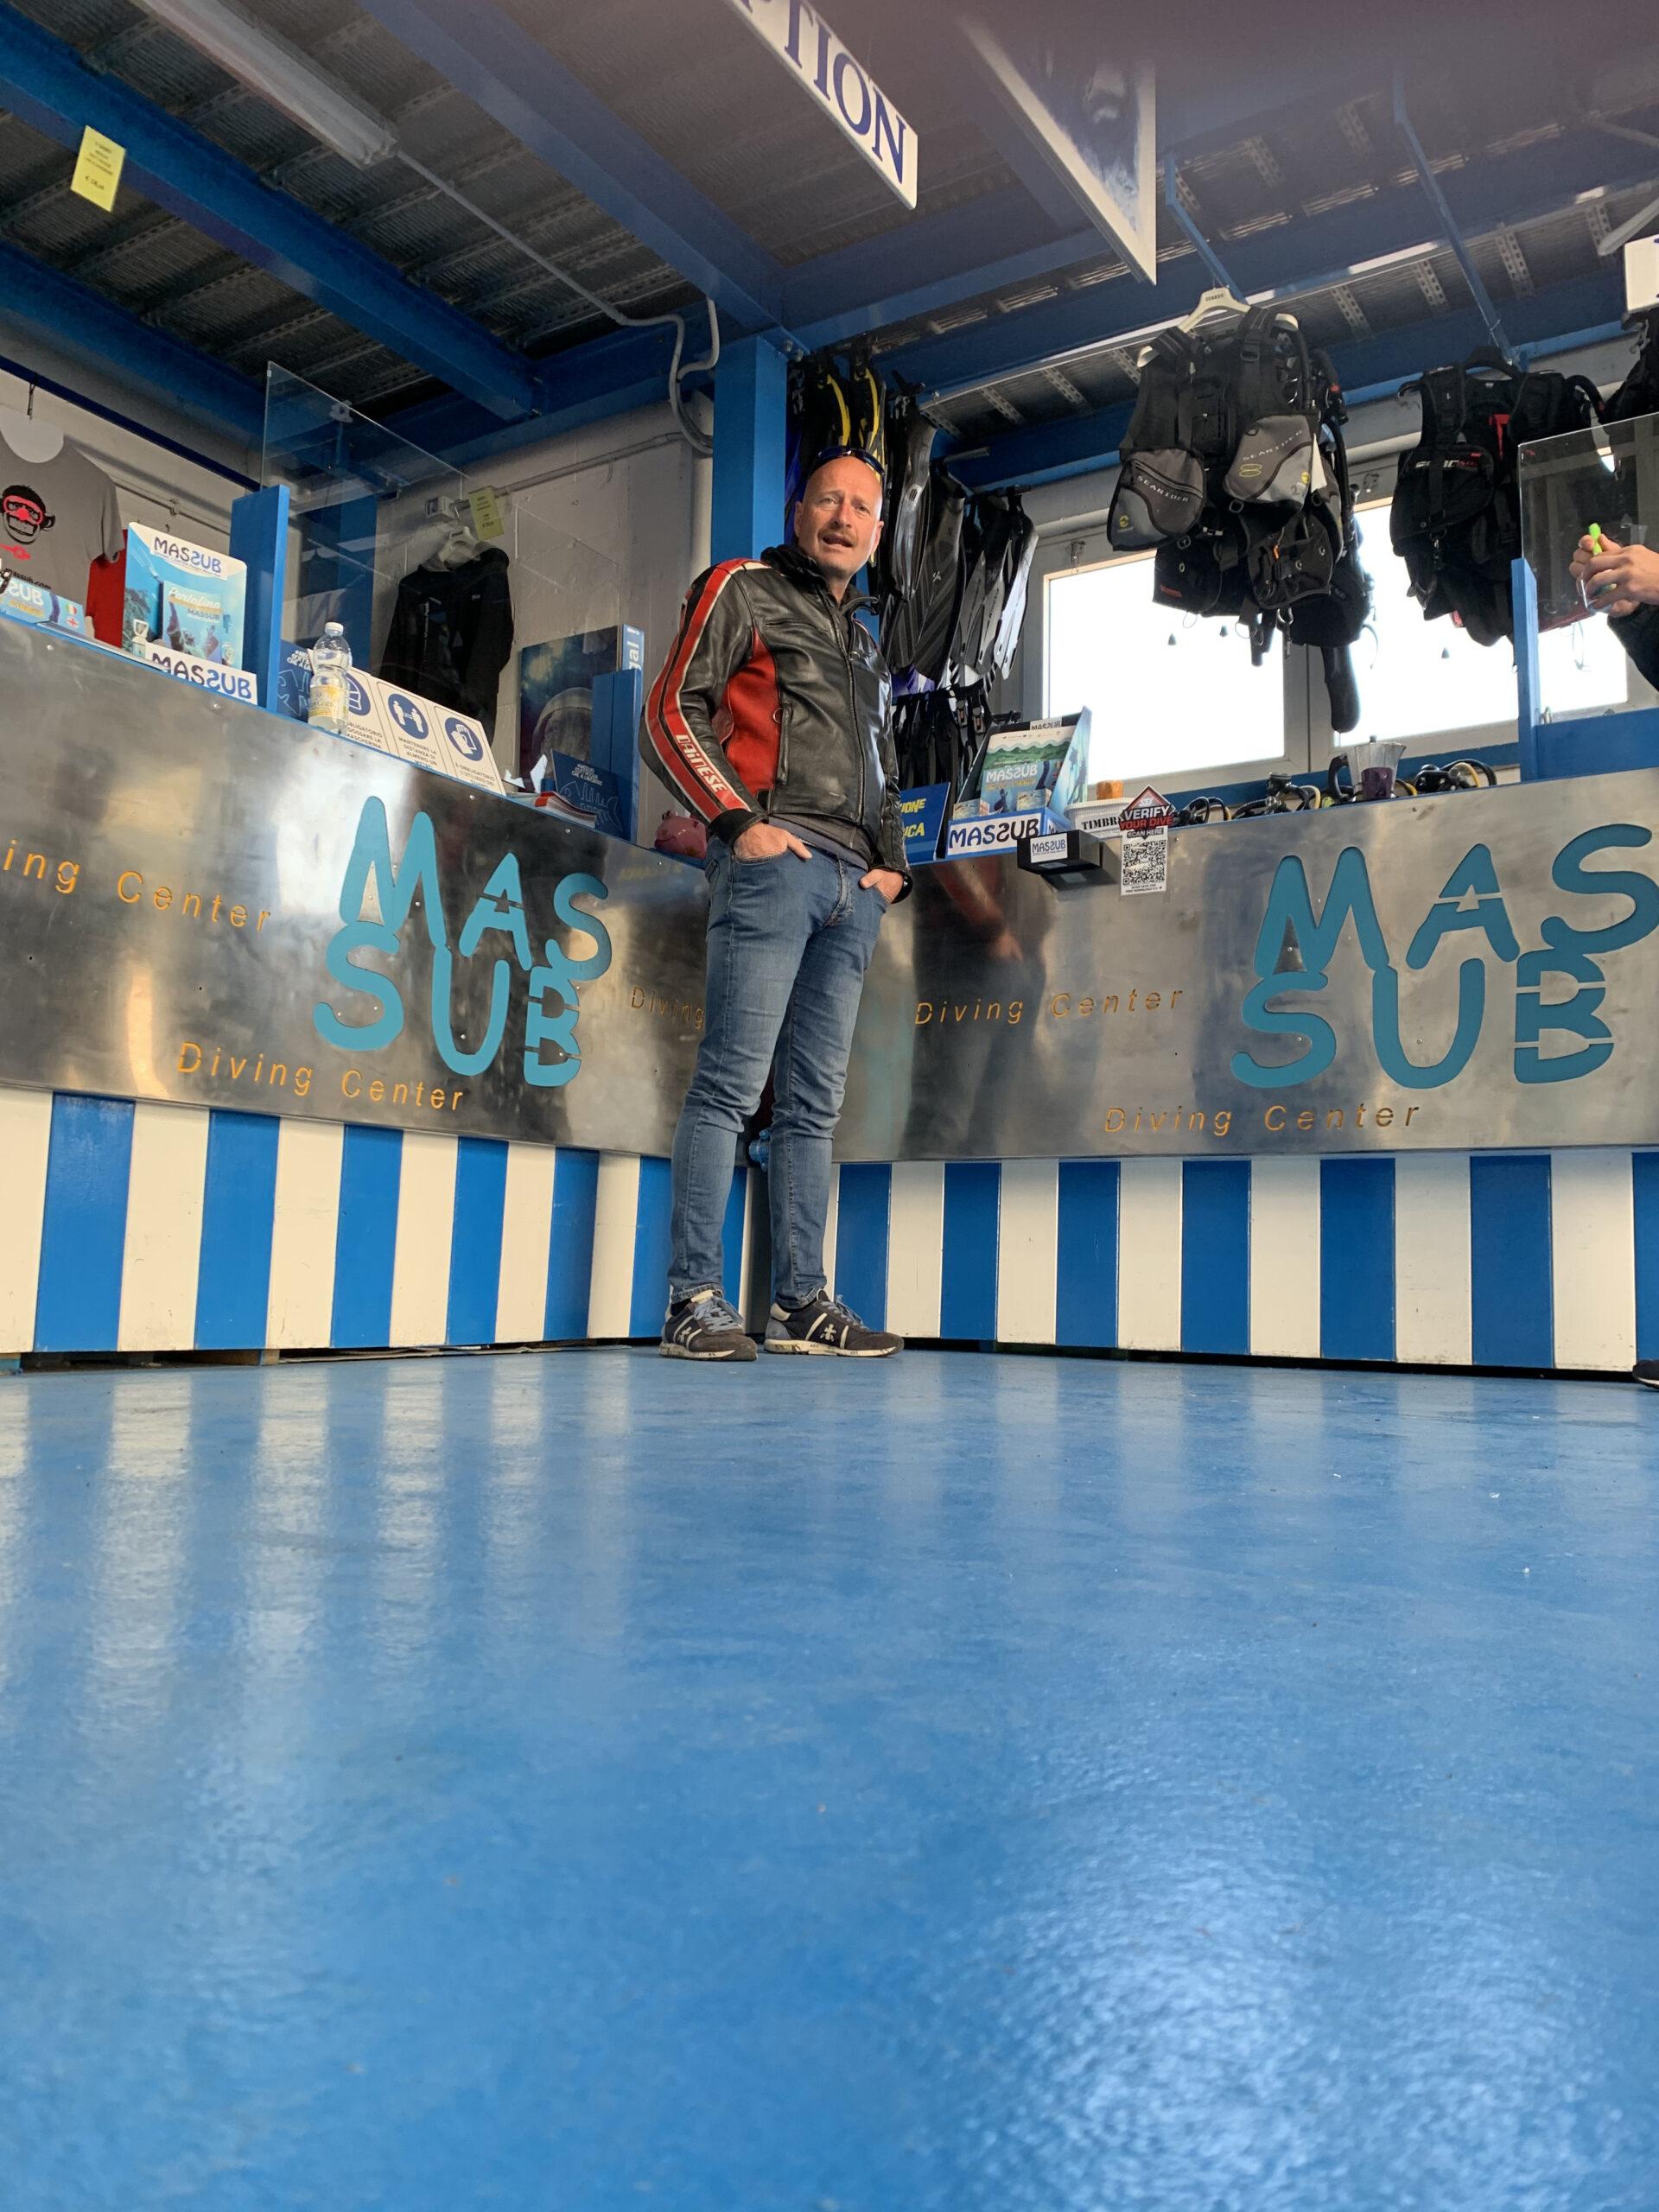 MASSUB diving center Portofino